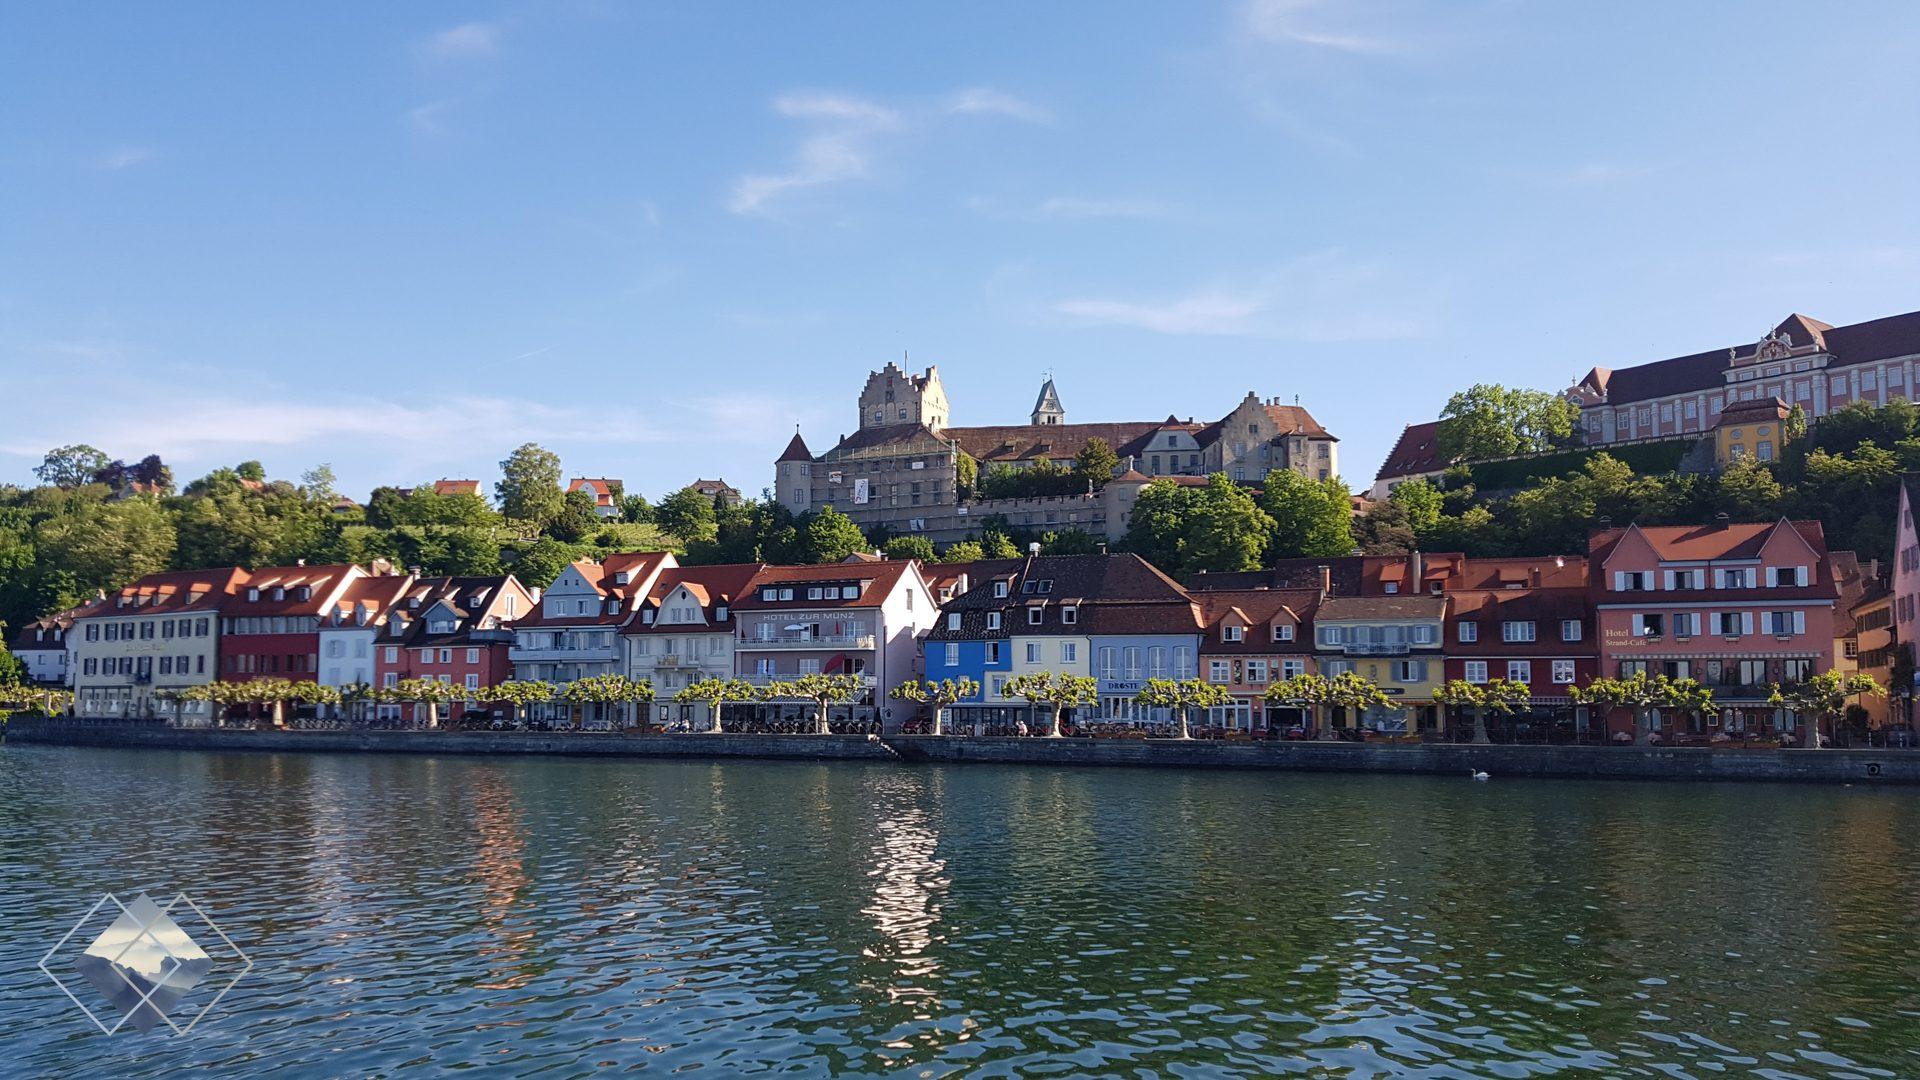 Meersburg Wasserfront